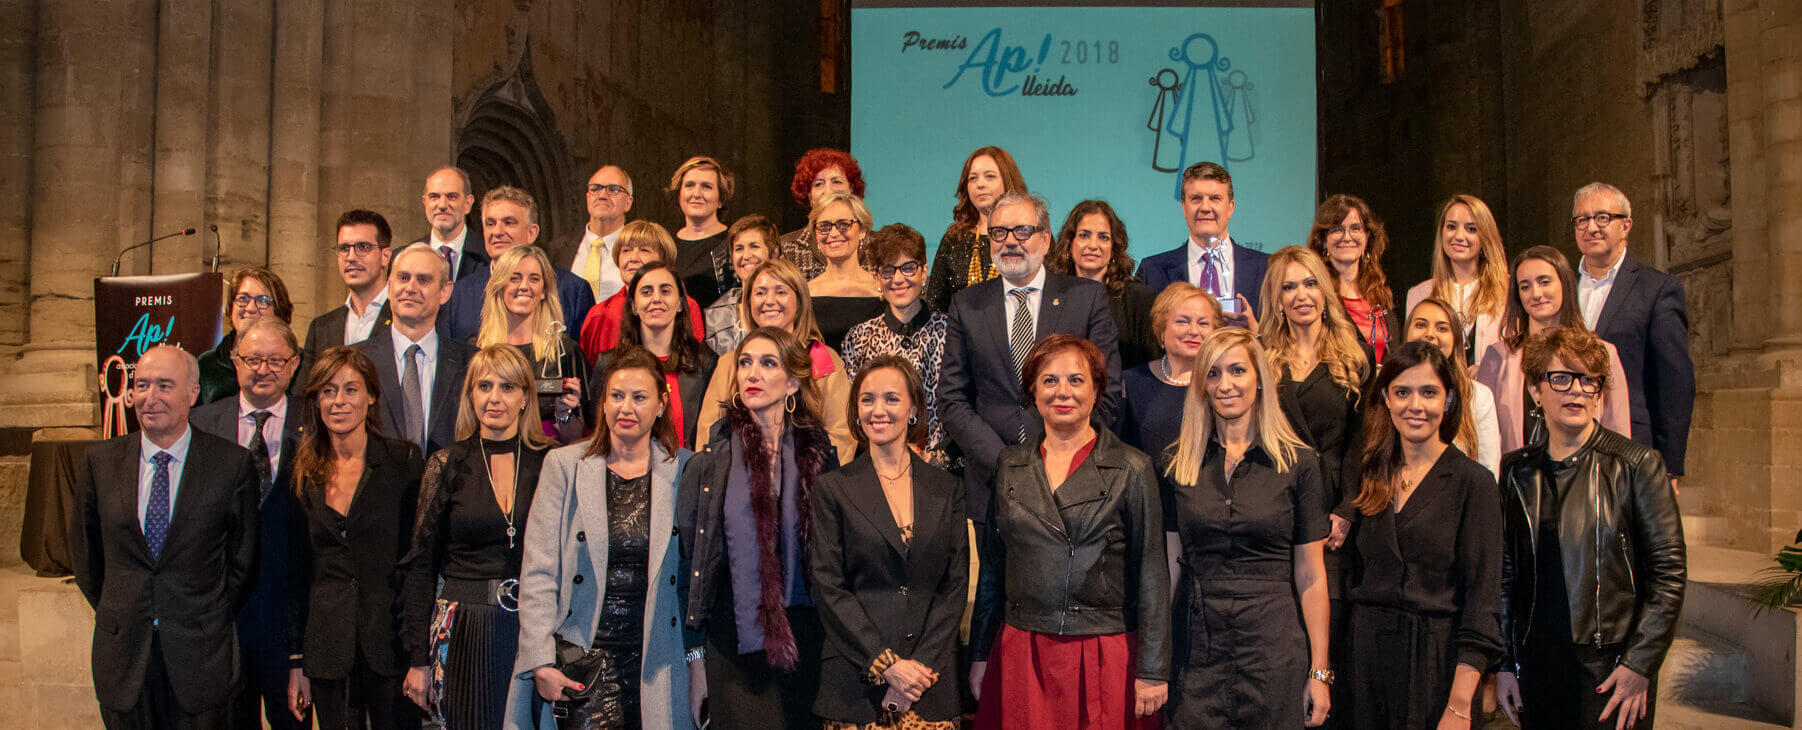 Premis Ap! Lleida Gala 2018